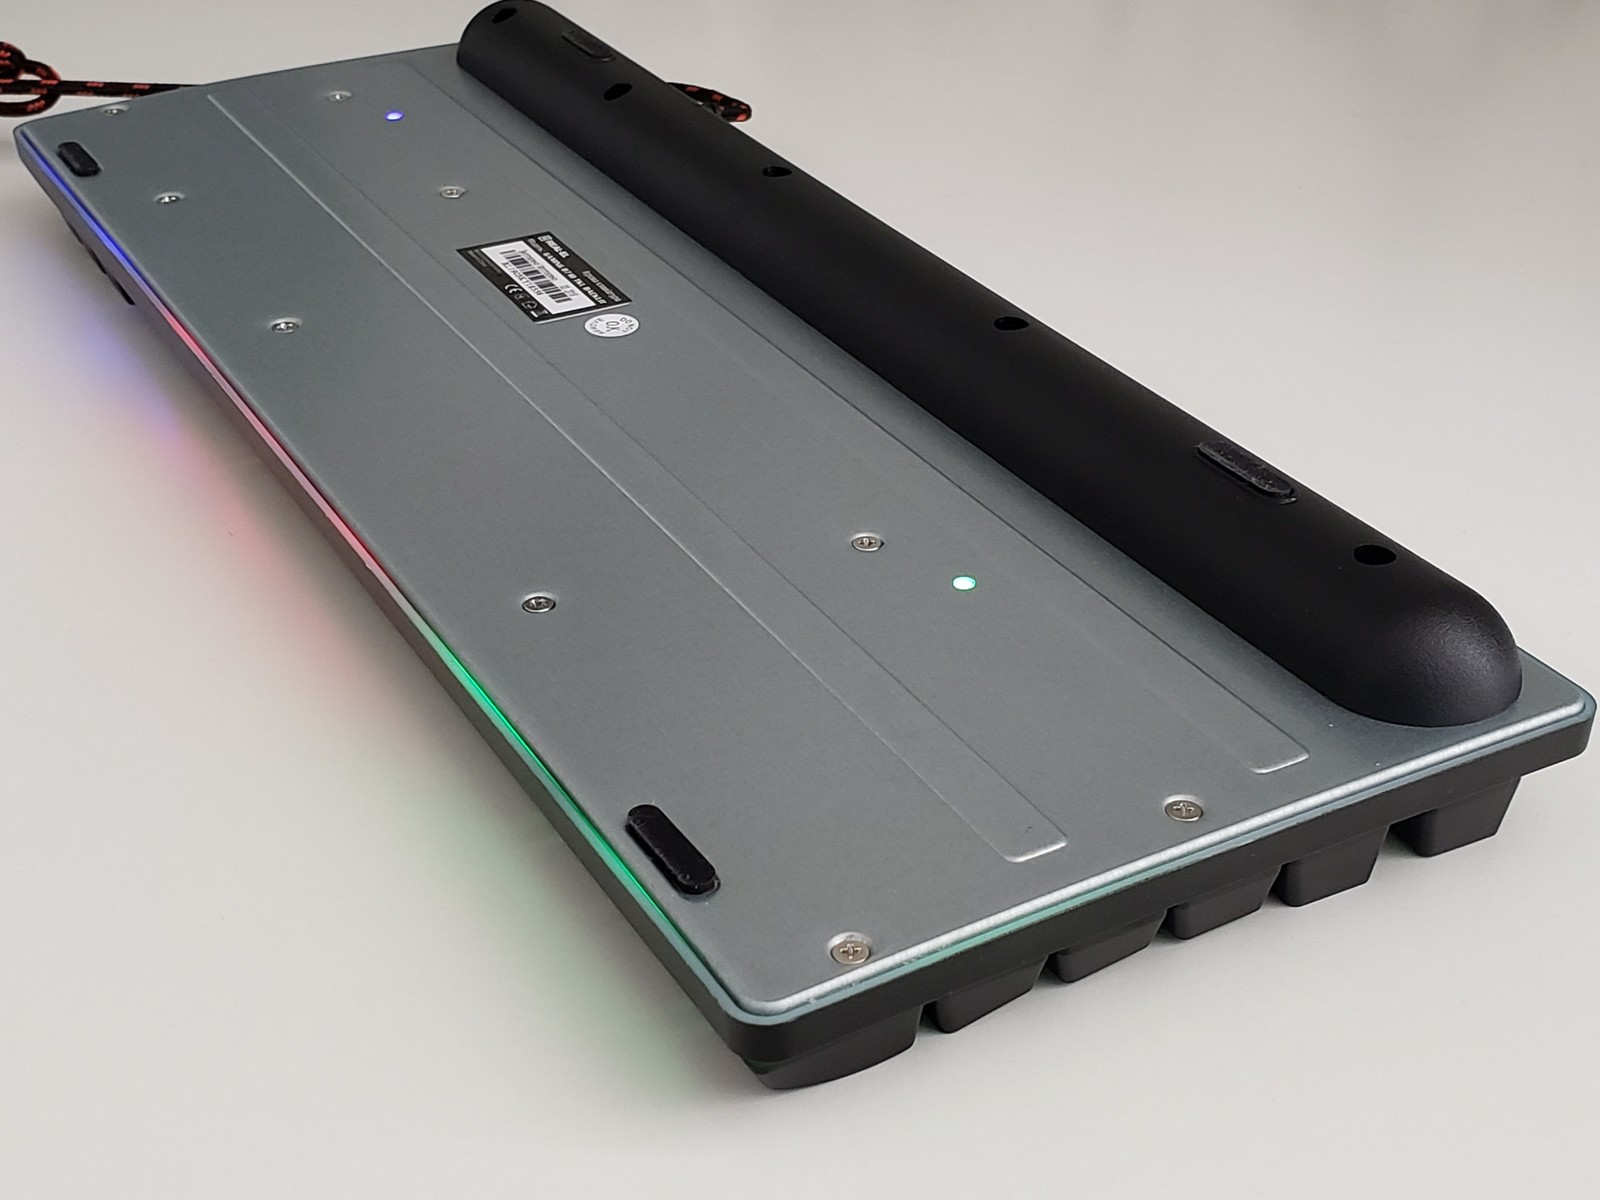 Фото нижней части корпуса клавиатуры REAL-EL Gaming 8710 TKL Backlit